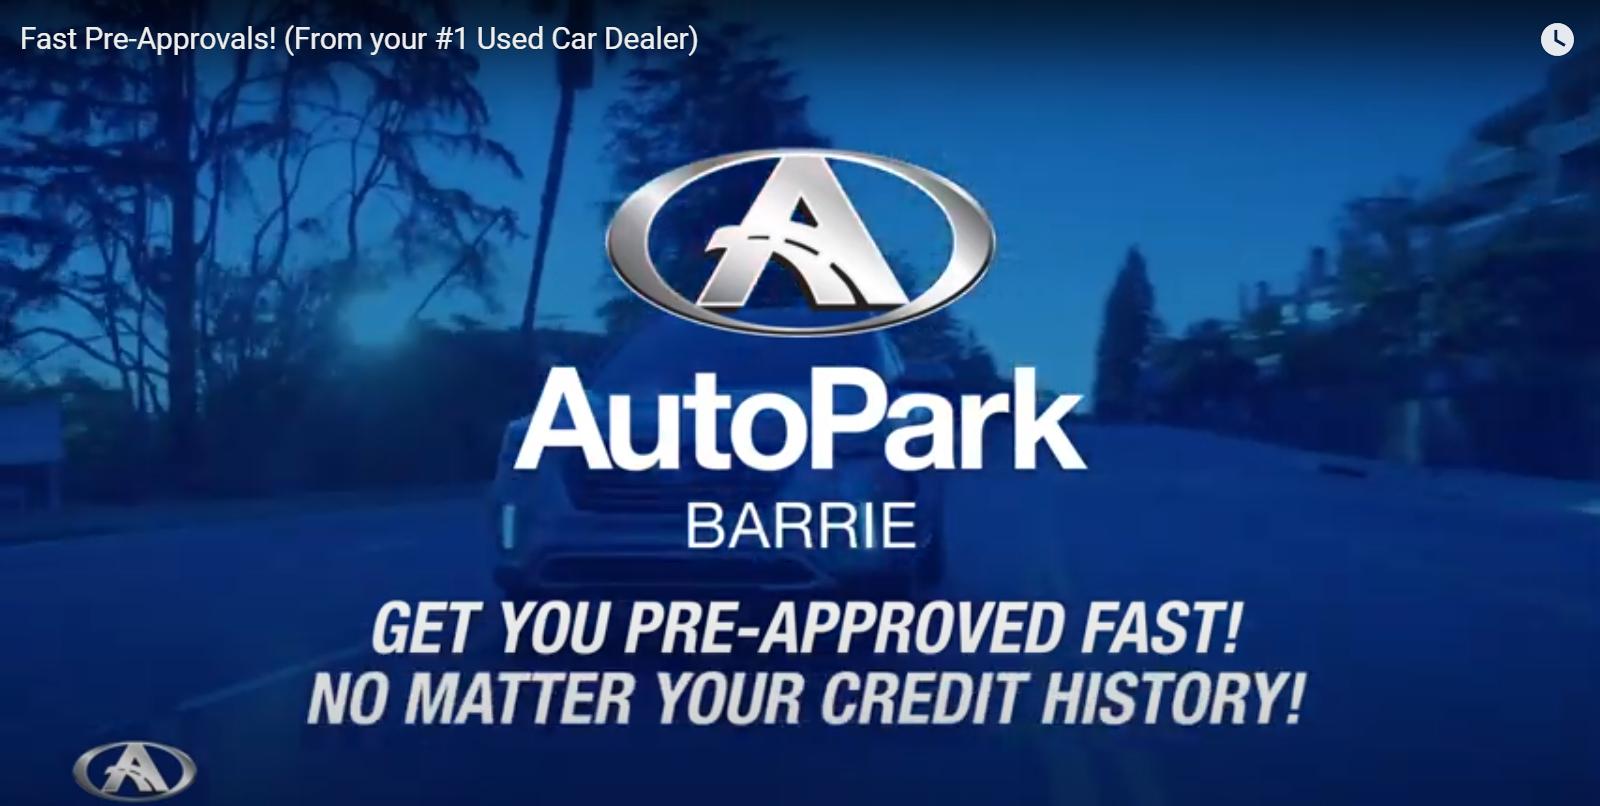 Fast_Pre_Approval_AutoPark_Brampton_Used_Car_Dealership_in_Brampton